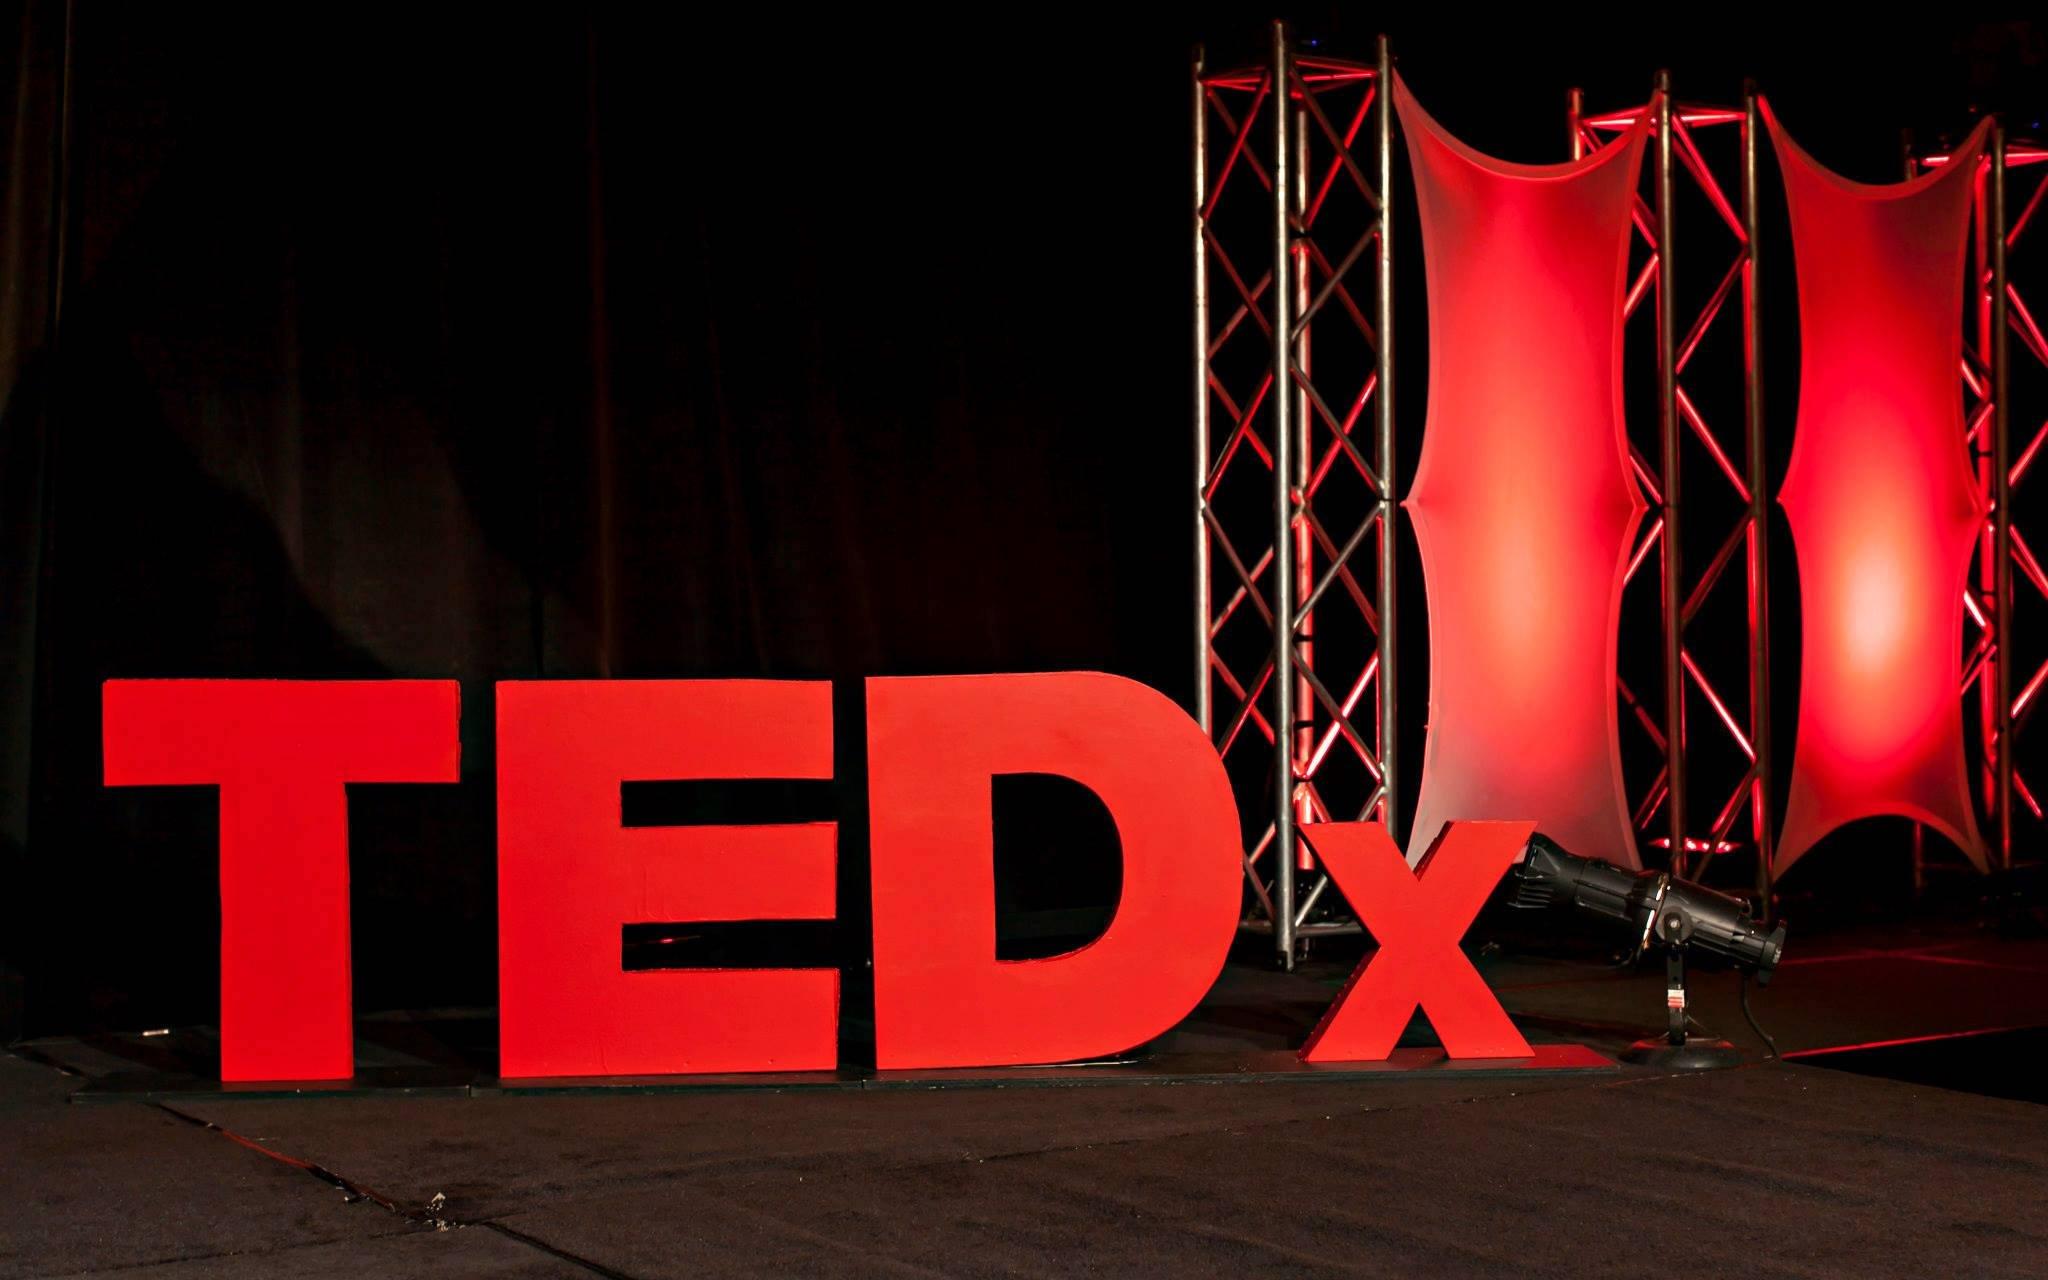 Las 10 charlas TED que deberías ver si no sabes qué hacer con tu vida (según TED)  https://t.co/bnNsNzzZzx https://t.co/ClCXpZiwto